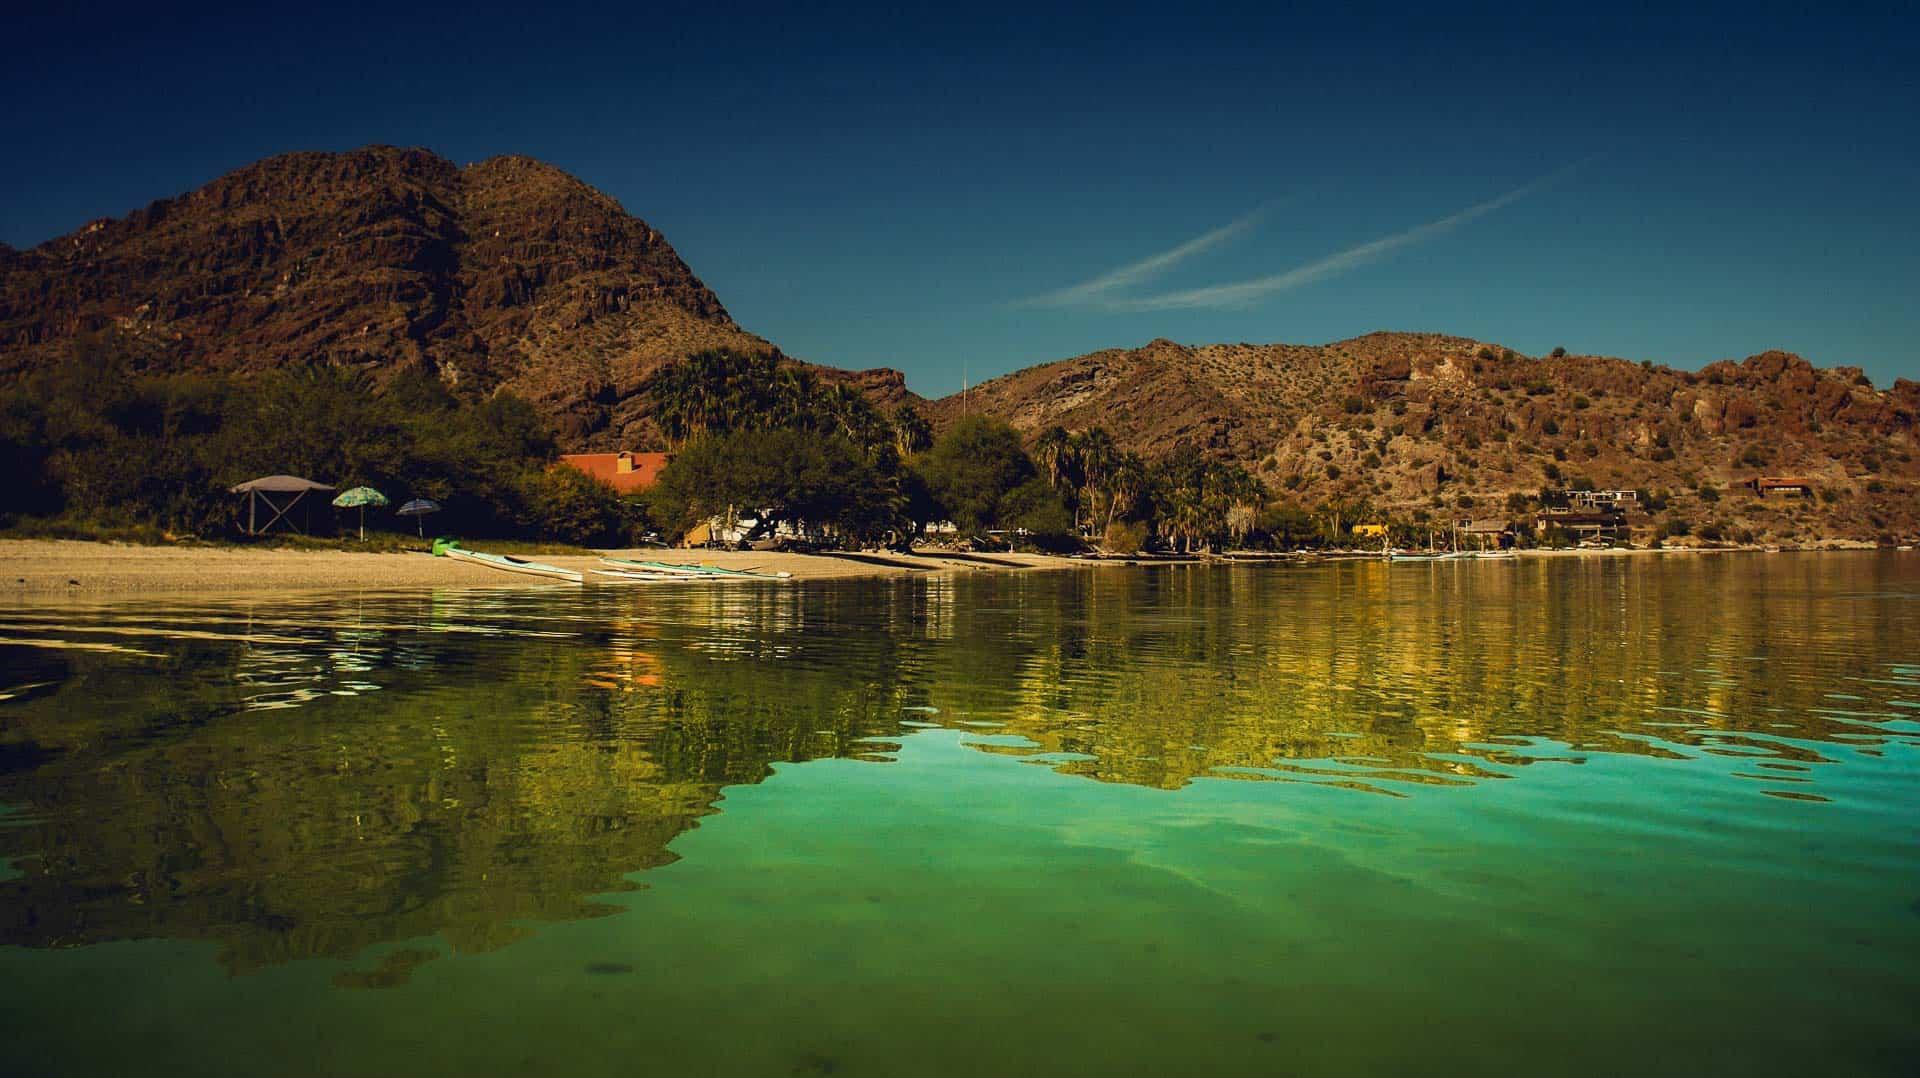 Playa El Coyote, Baja California | Beach close to Mulegé